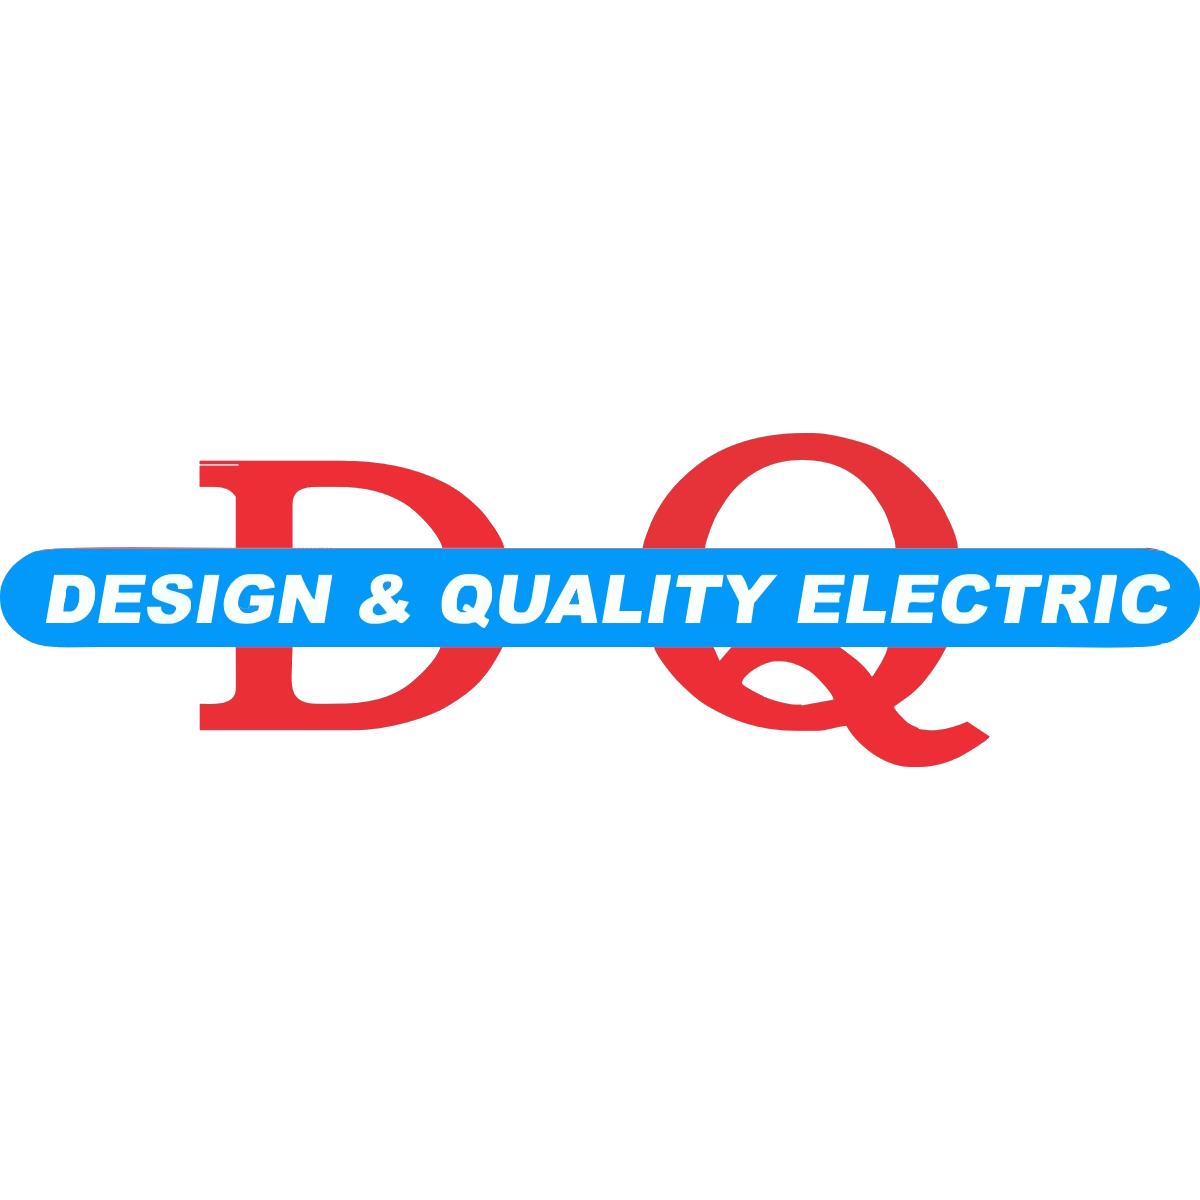 Design & Quality Electric, Inc image 5